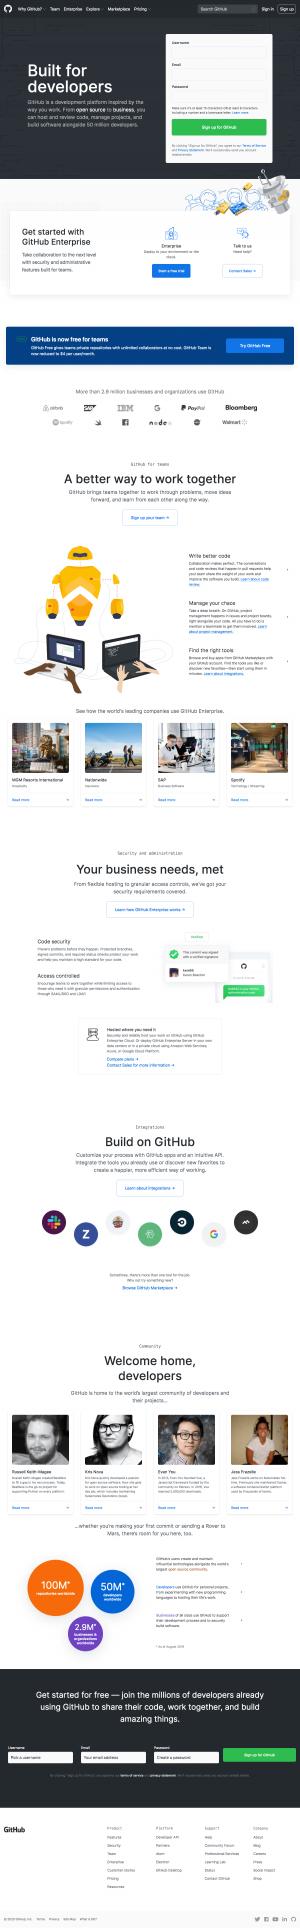 GitHub - Homepage